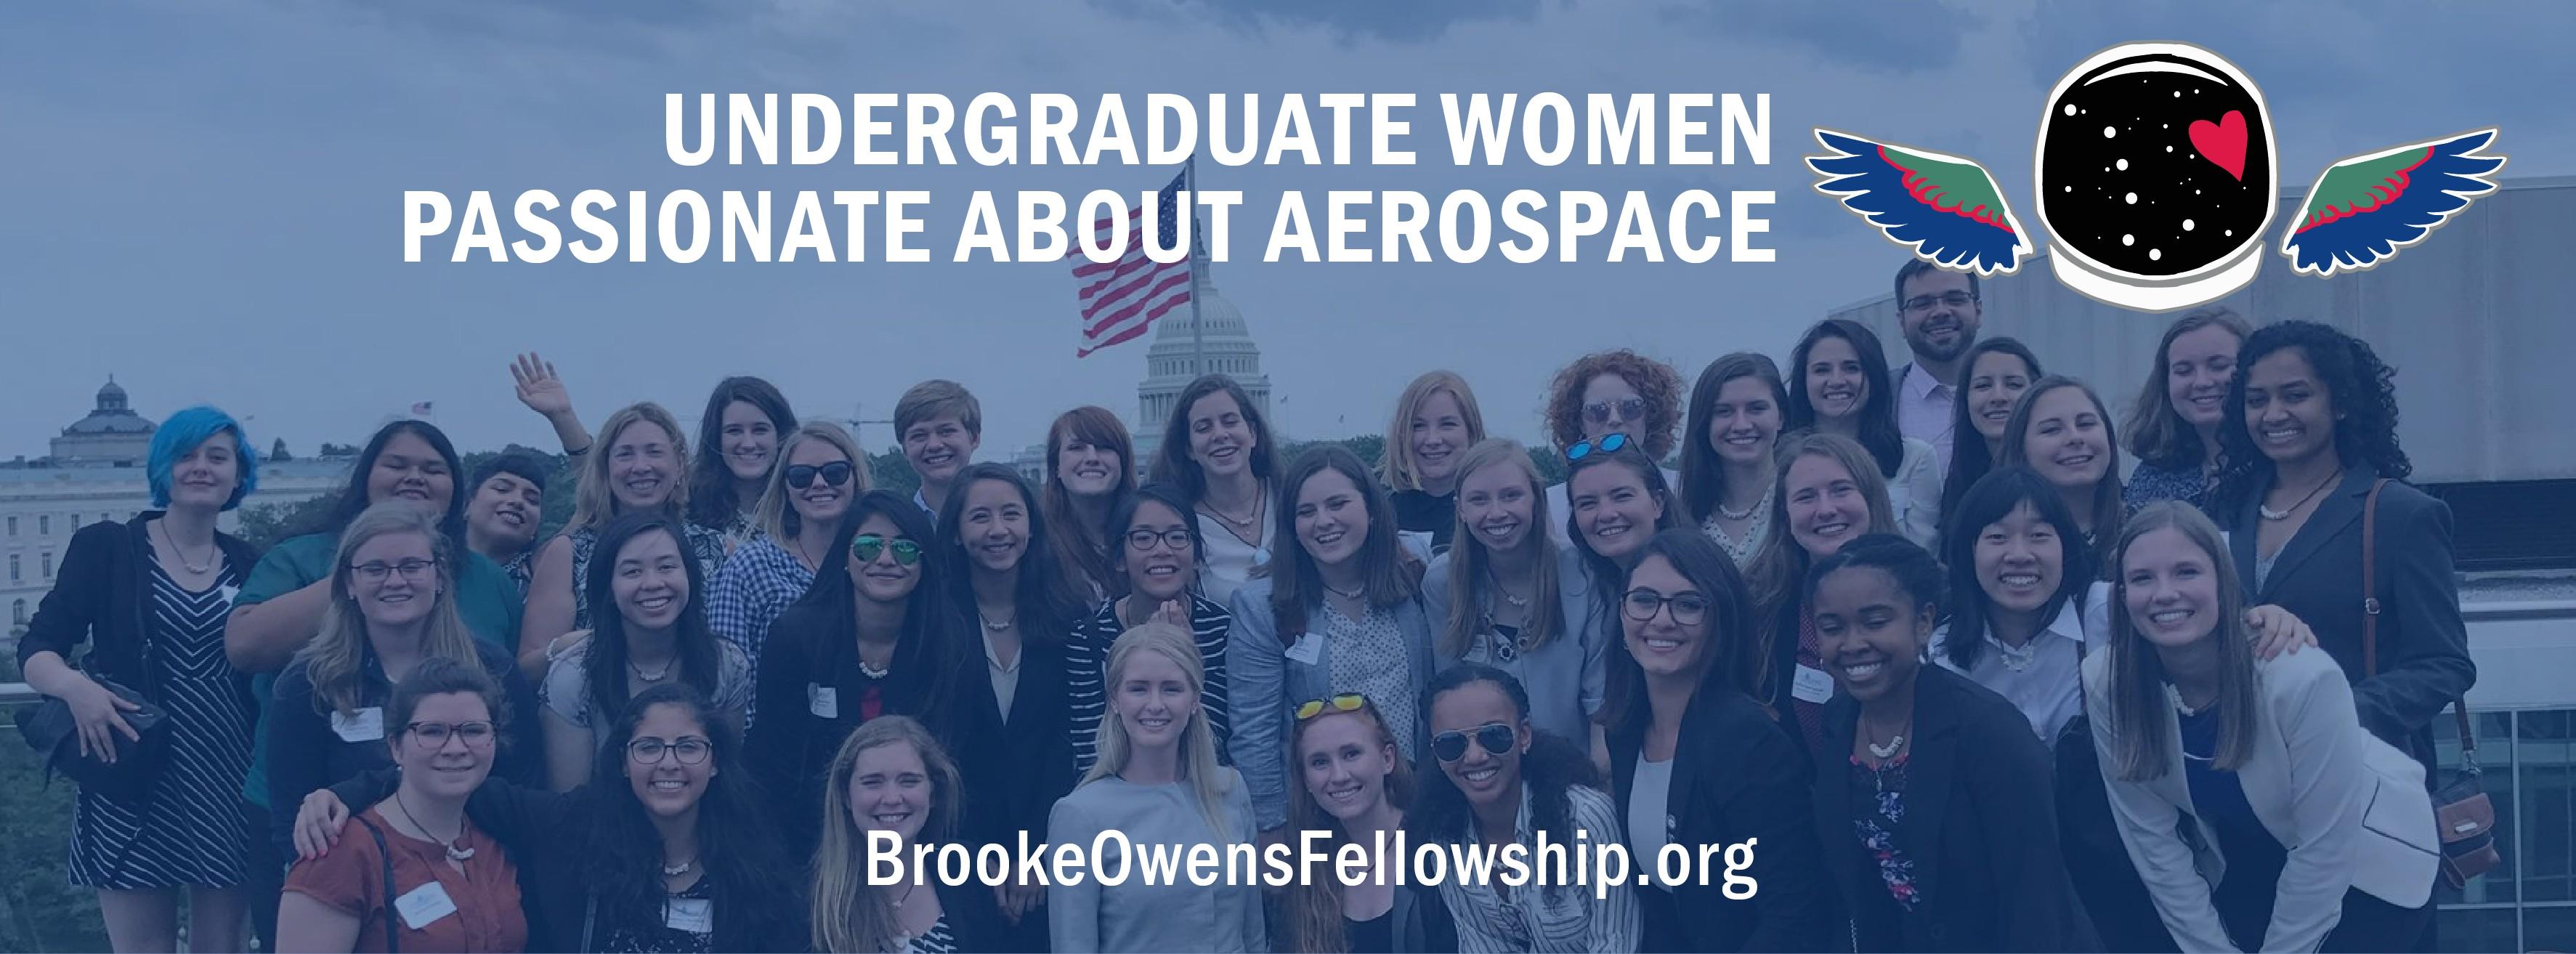 Brooke Owens Fellowship | LinkedIn